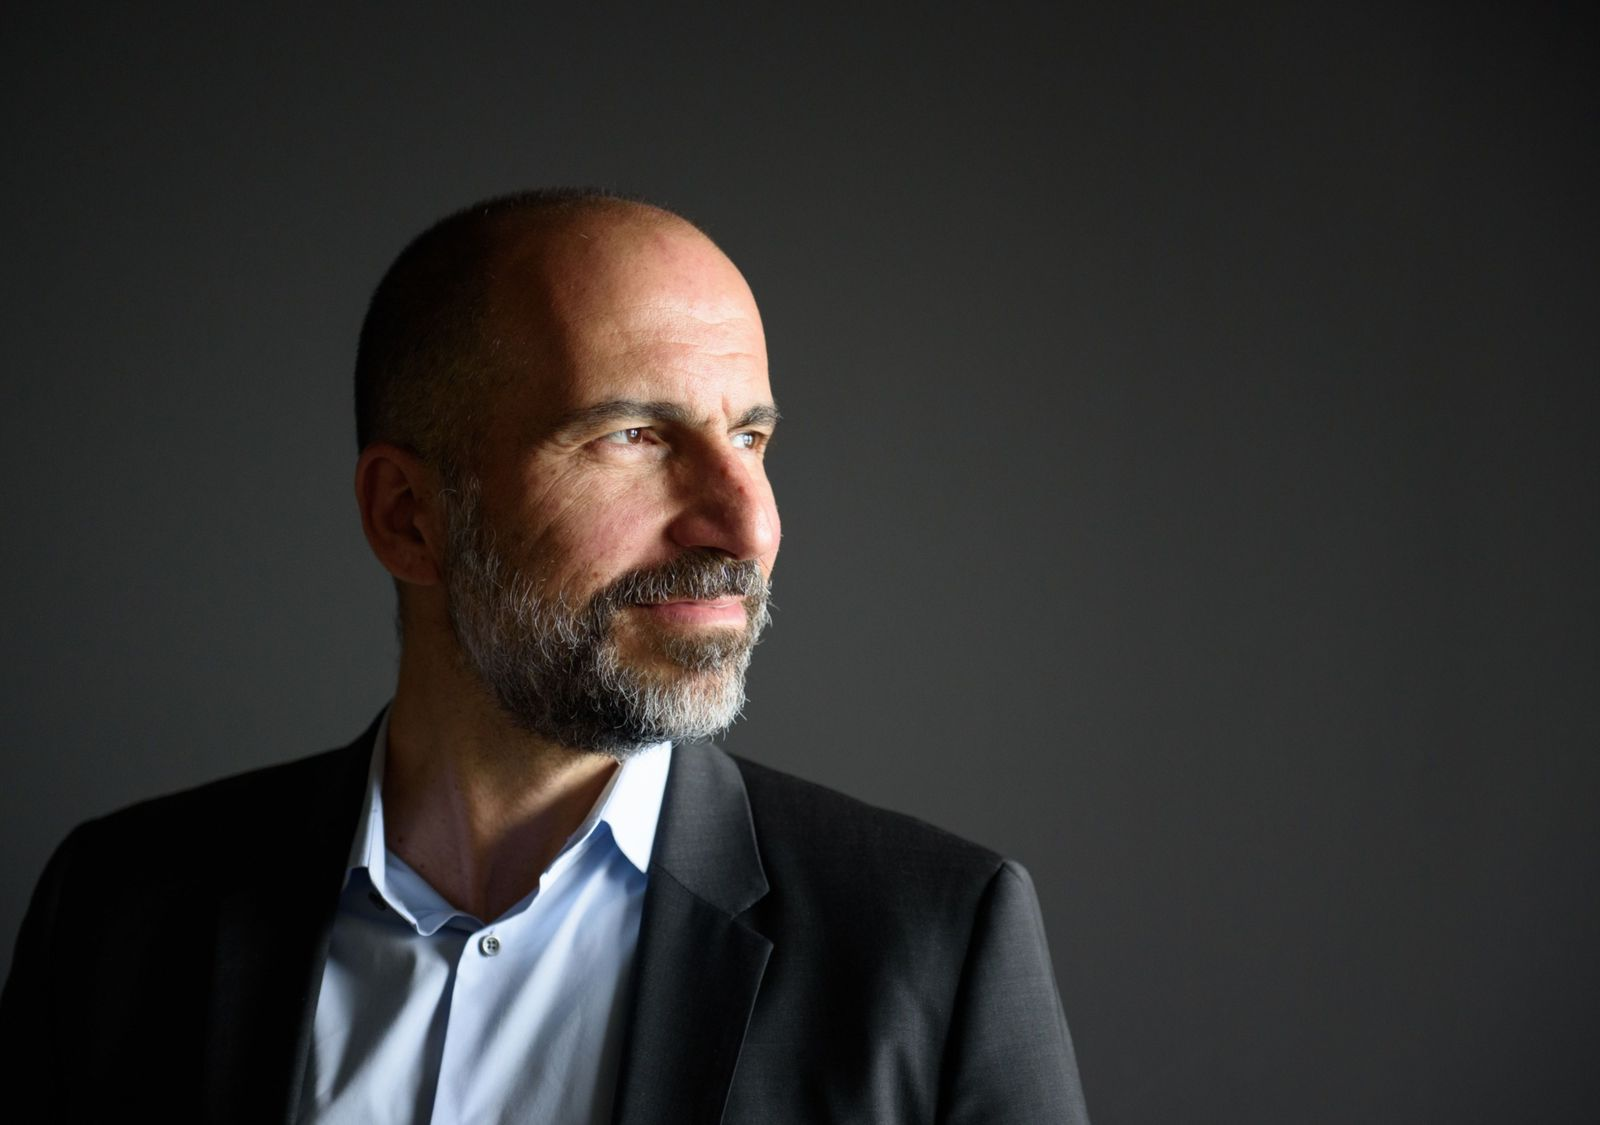 Uber Technologies CEO Dara Khosrowshahi Interview